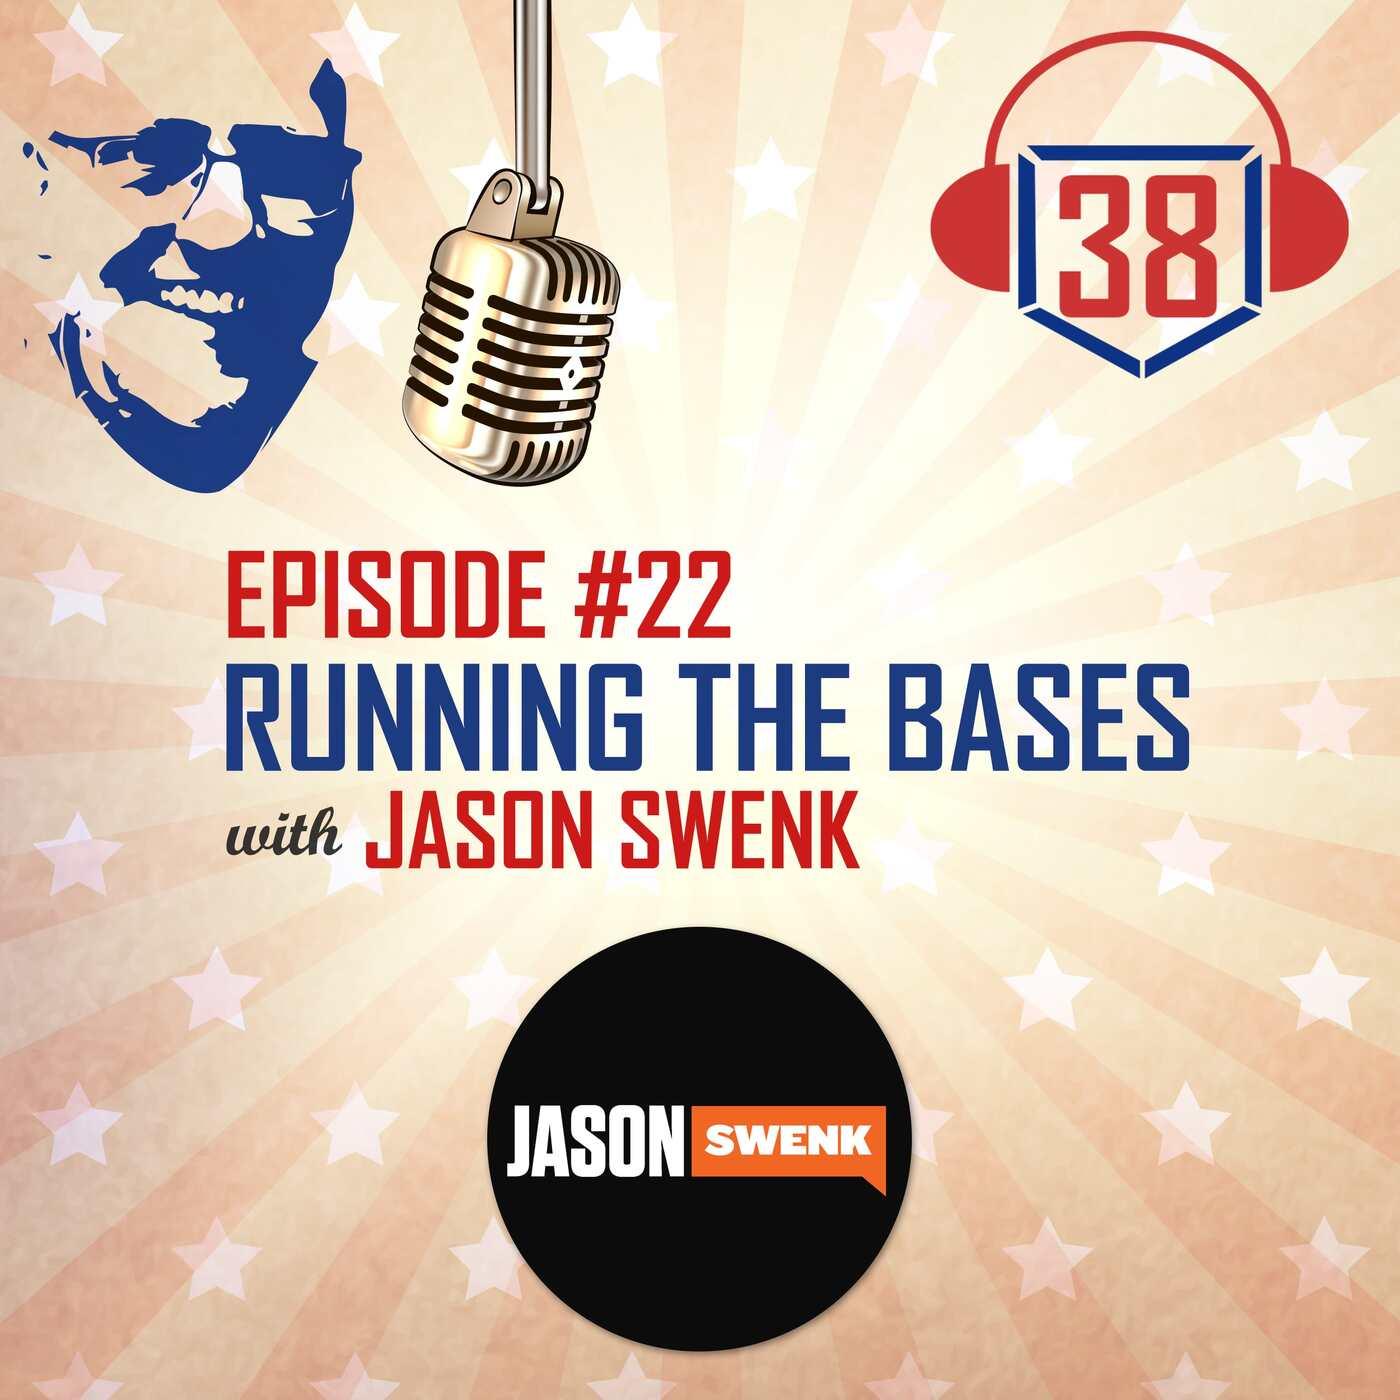 38 Digital Market Announces New Podcast Episode with Agency Advisor Jason Swenk